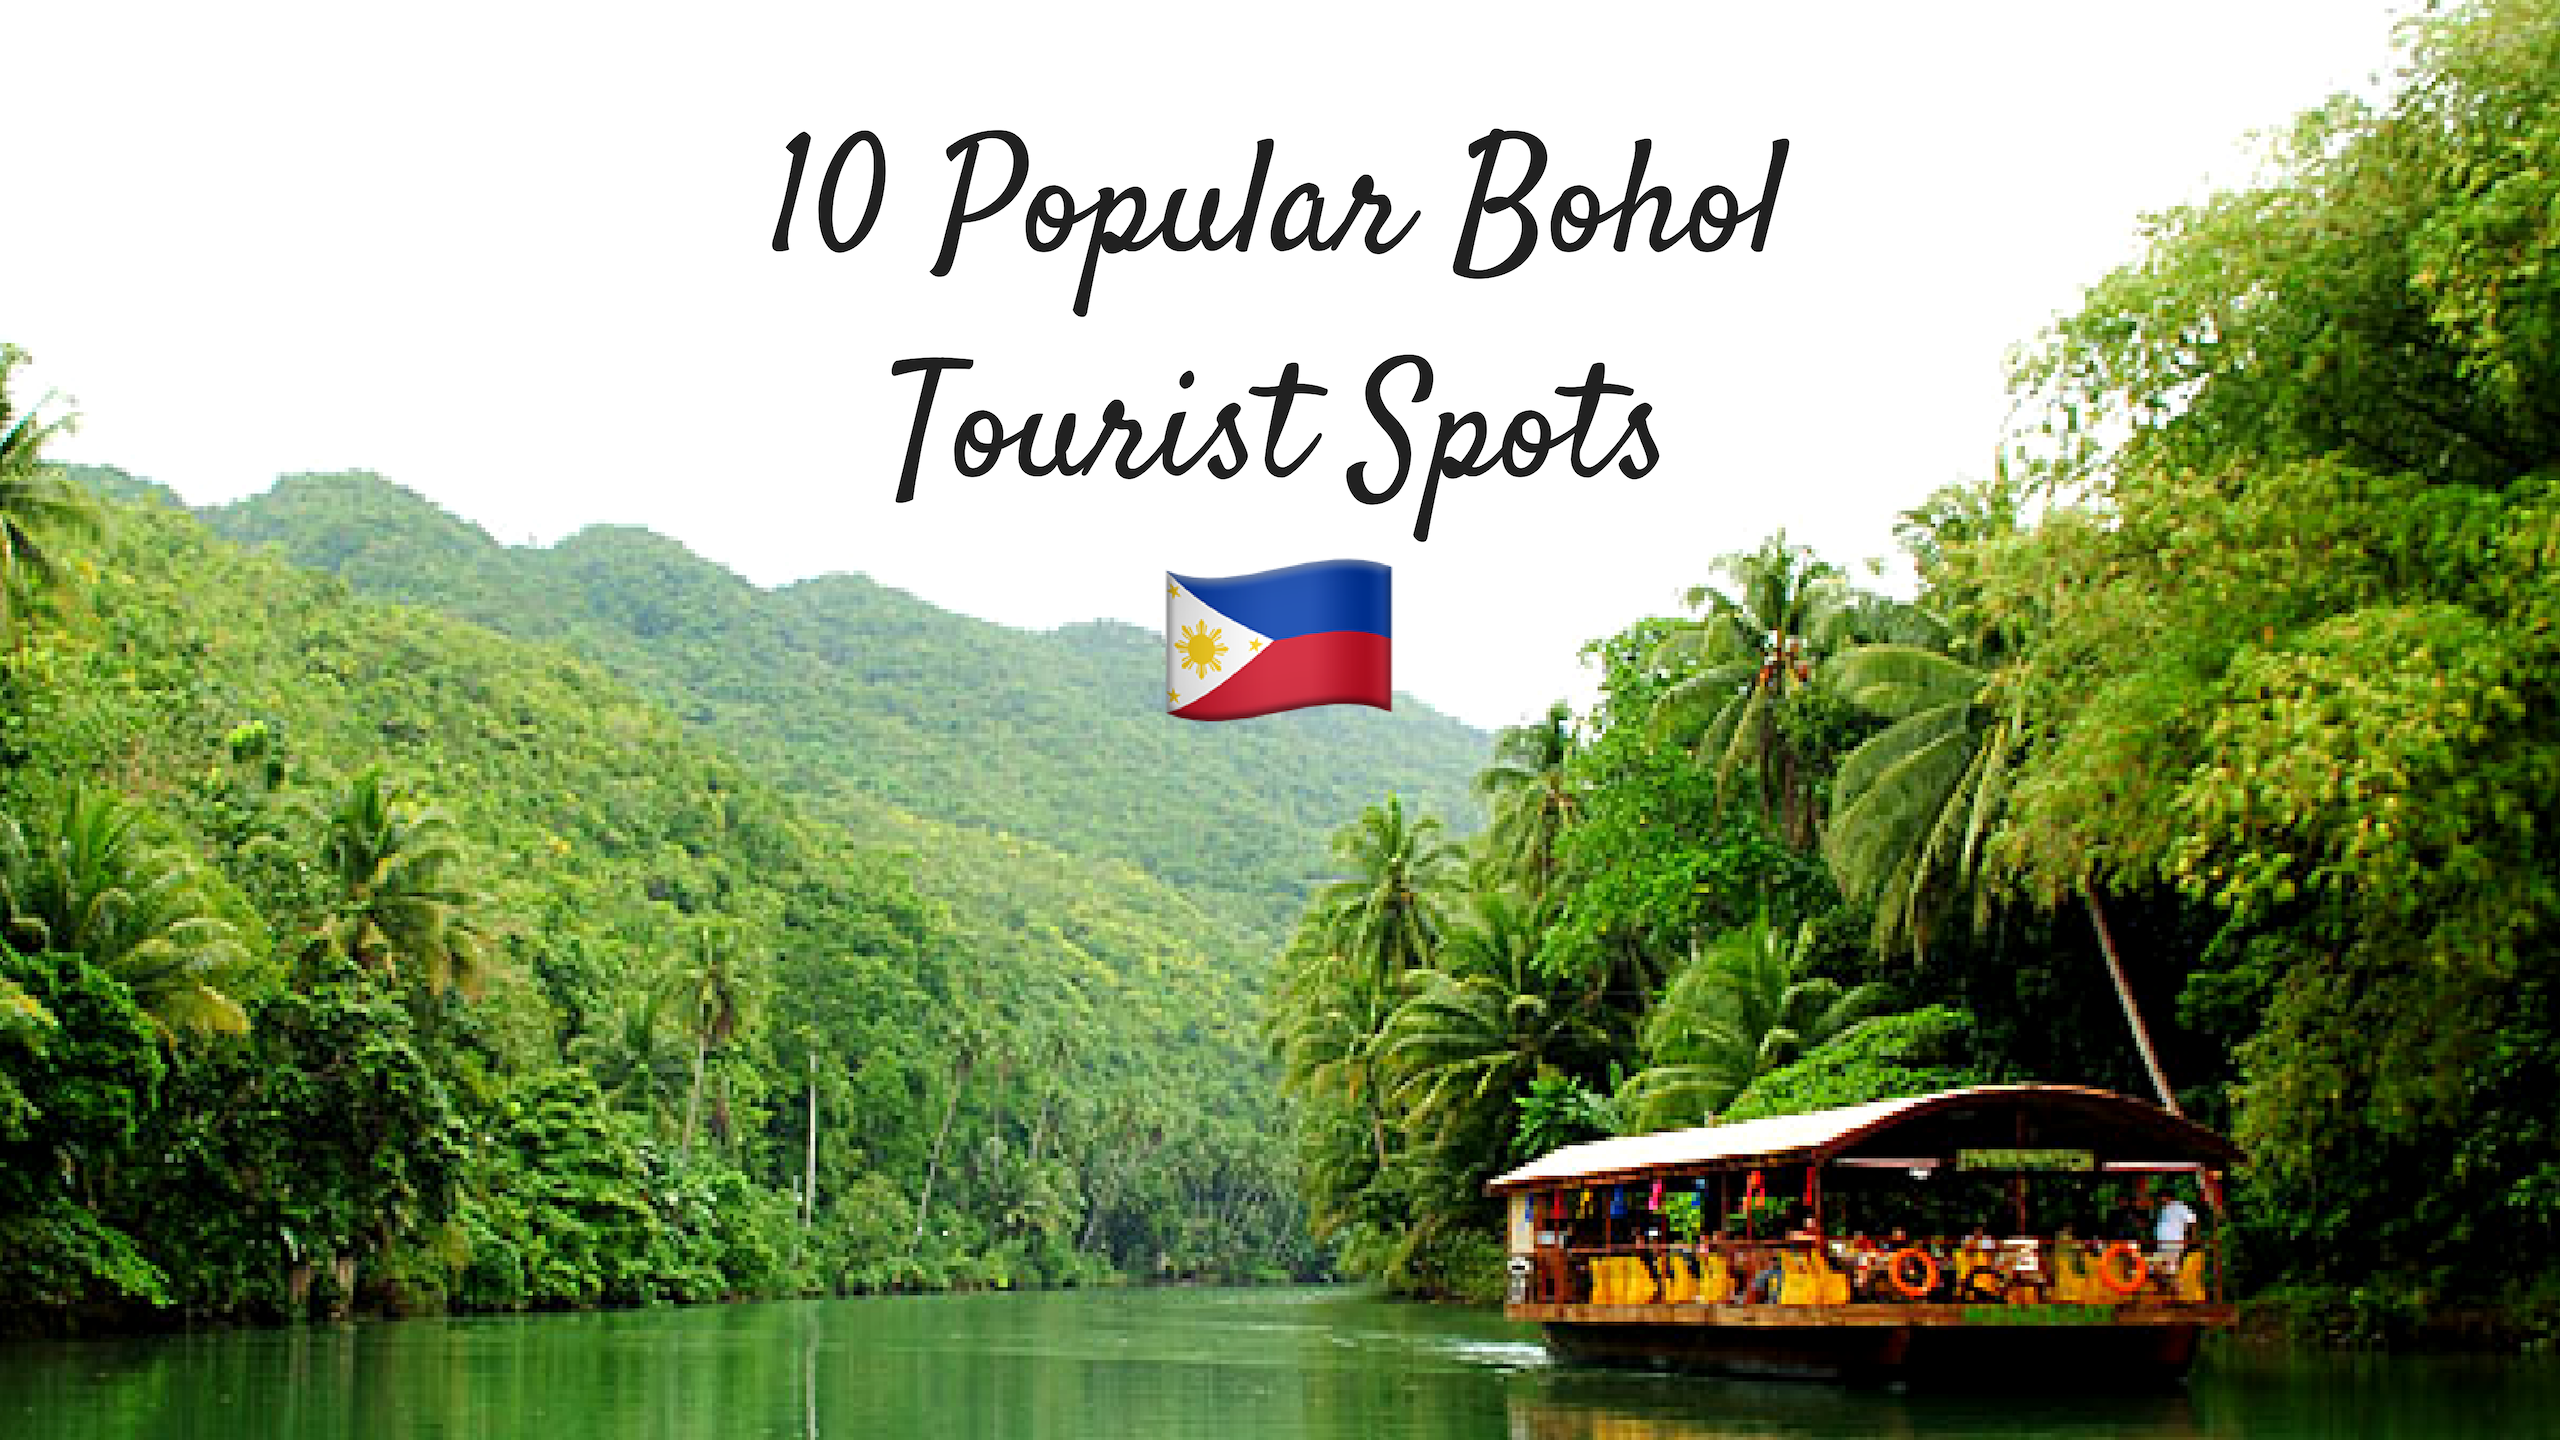 Bohol Tourist Spots